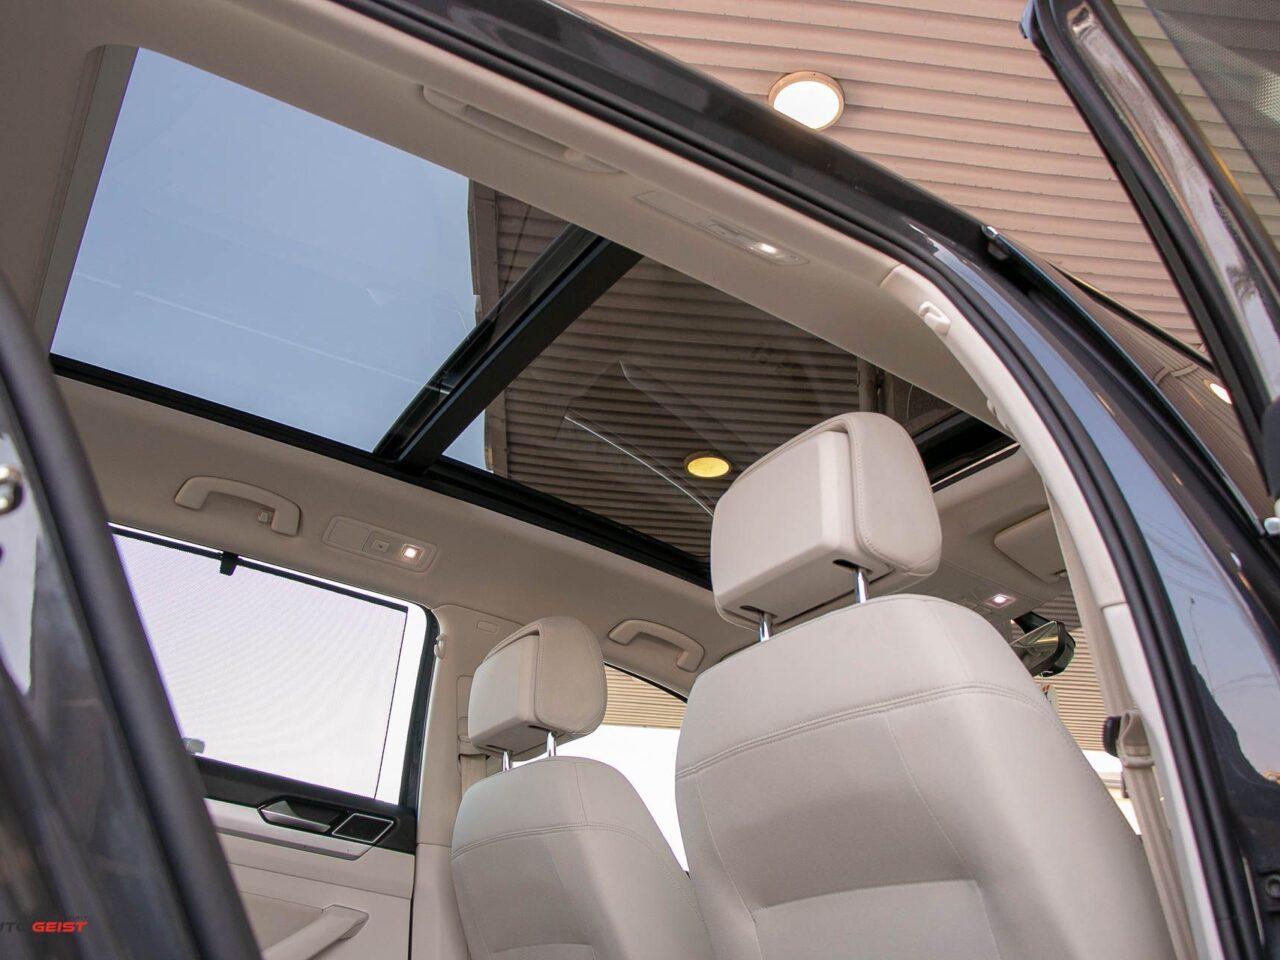 VW-PASSAT-break-panoramic-4533